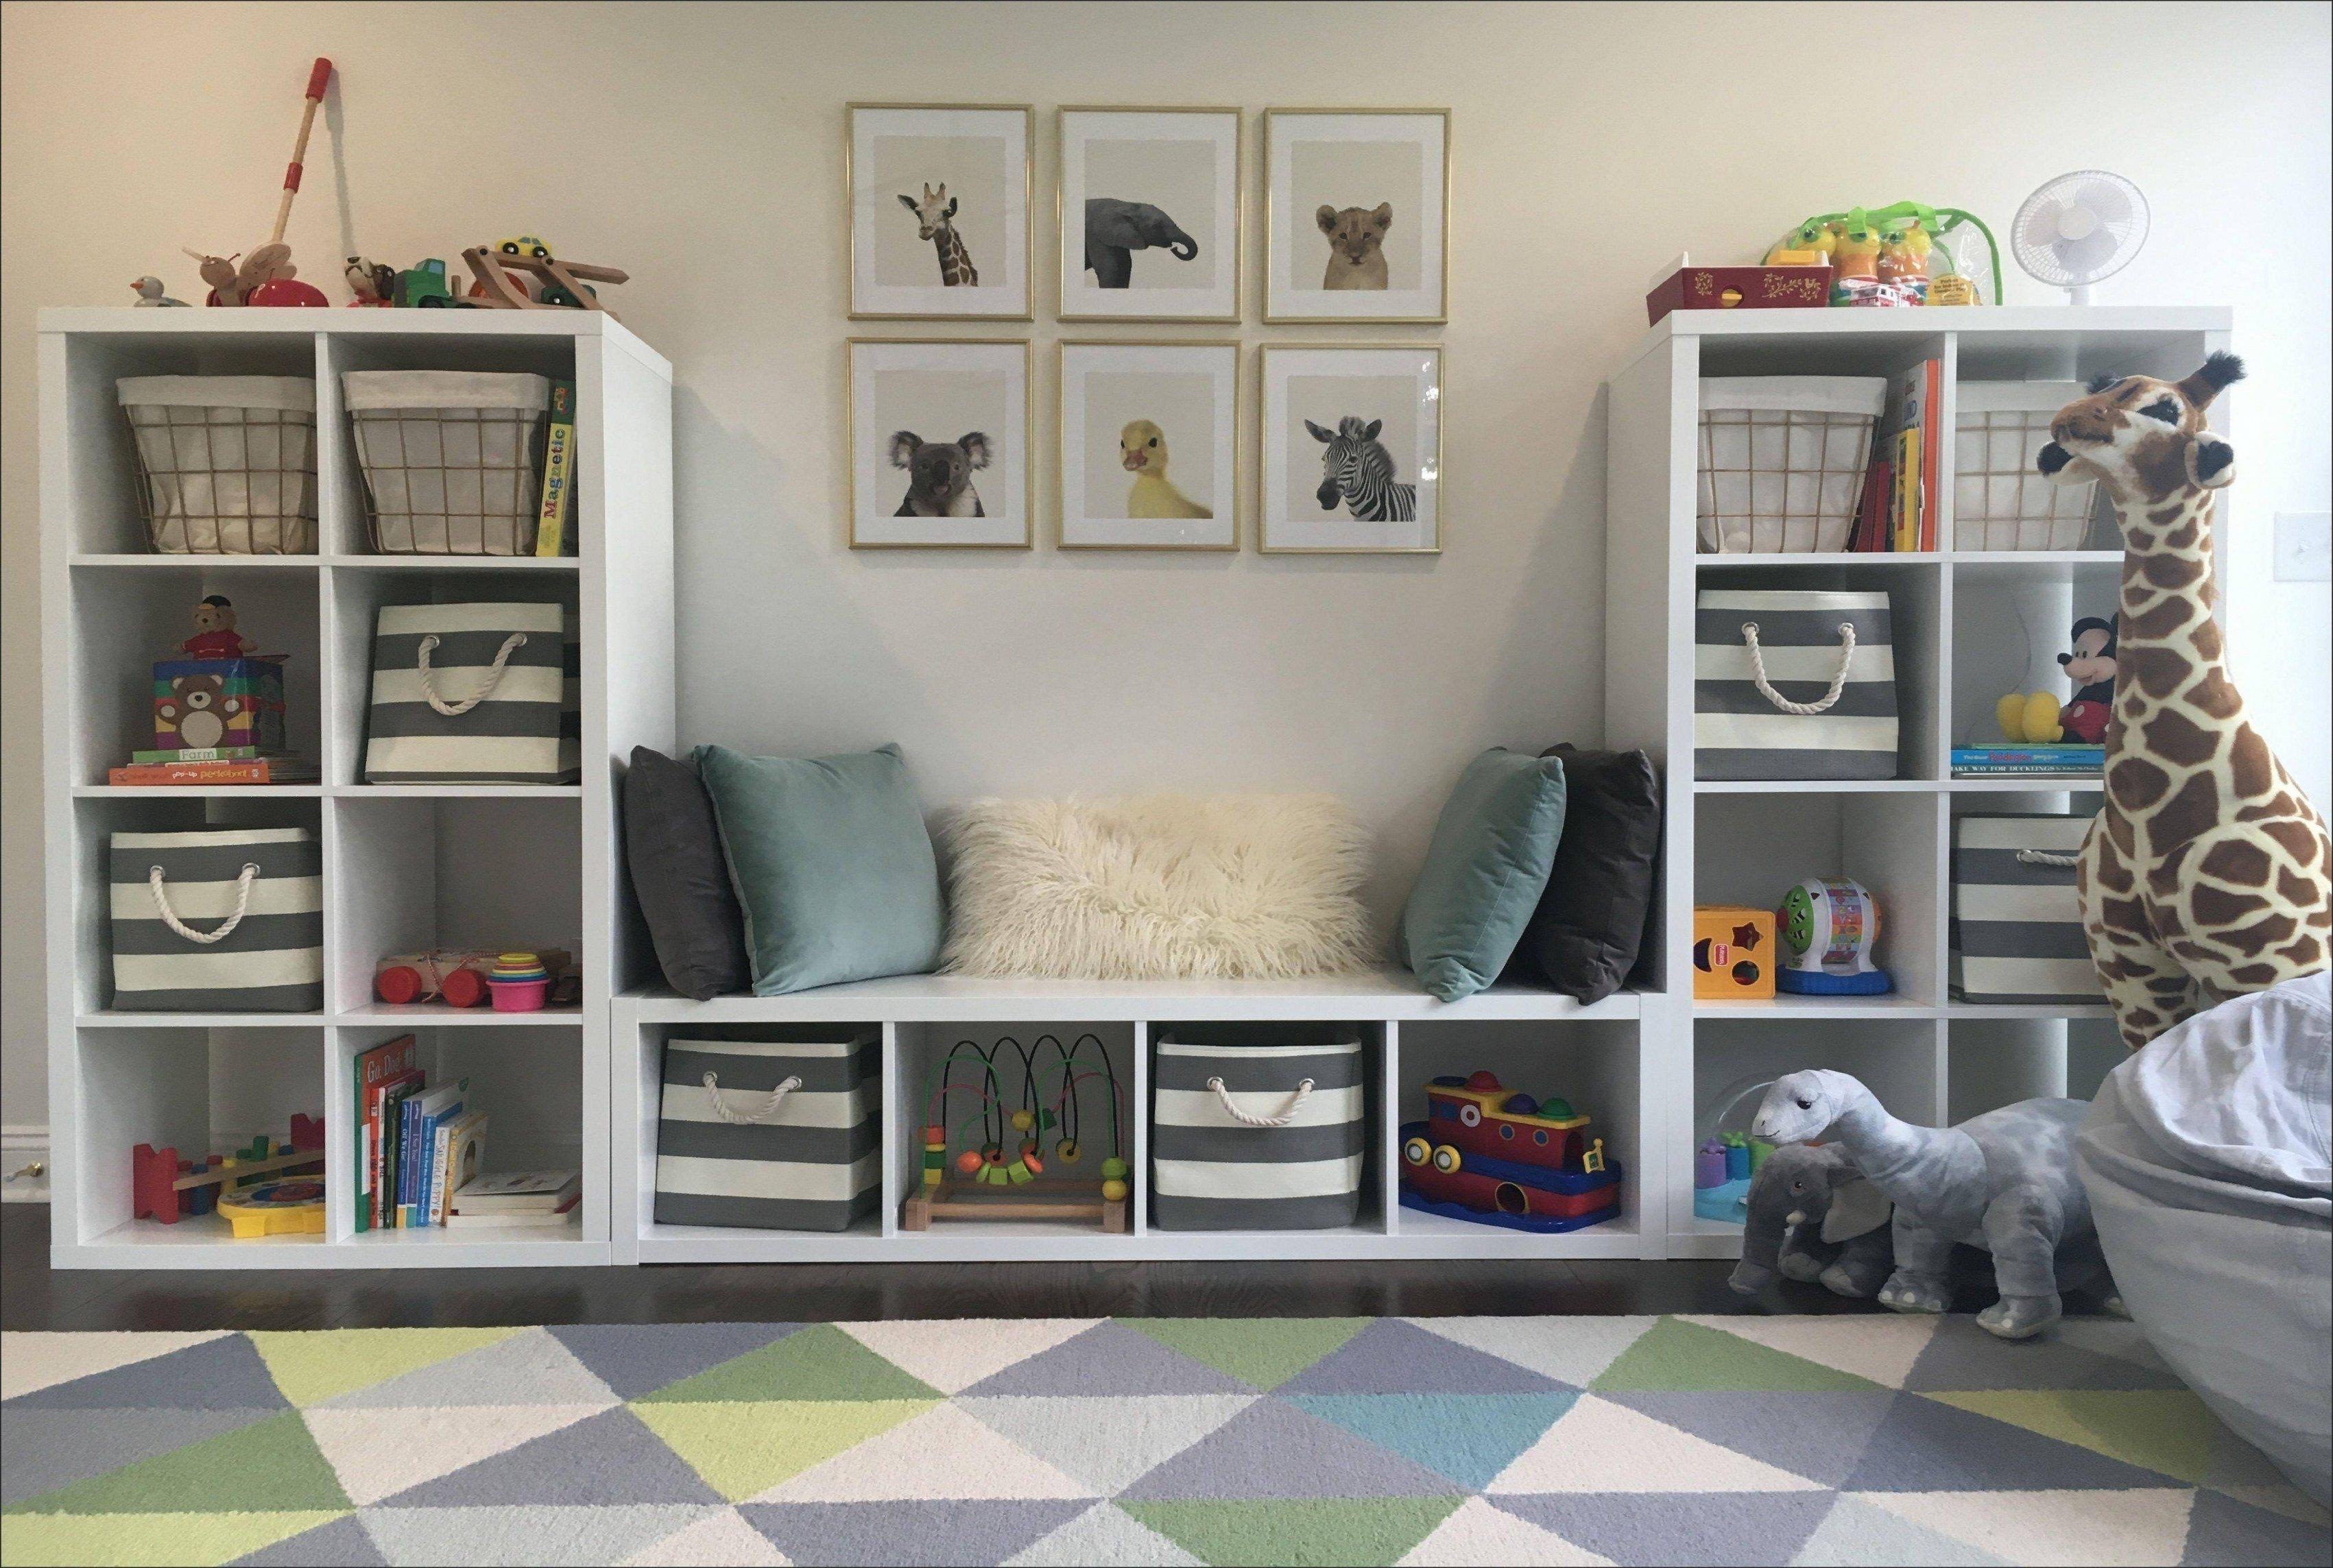 Bedroom Sitting area Ideas Luxury Living Room Ideas Bedroom Ideas for Small Rooms